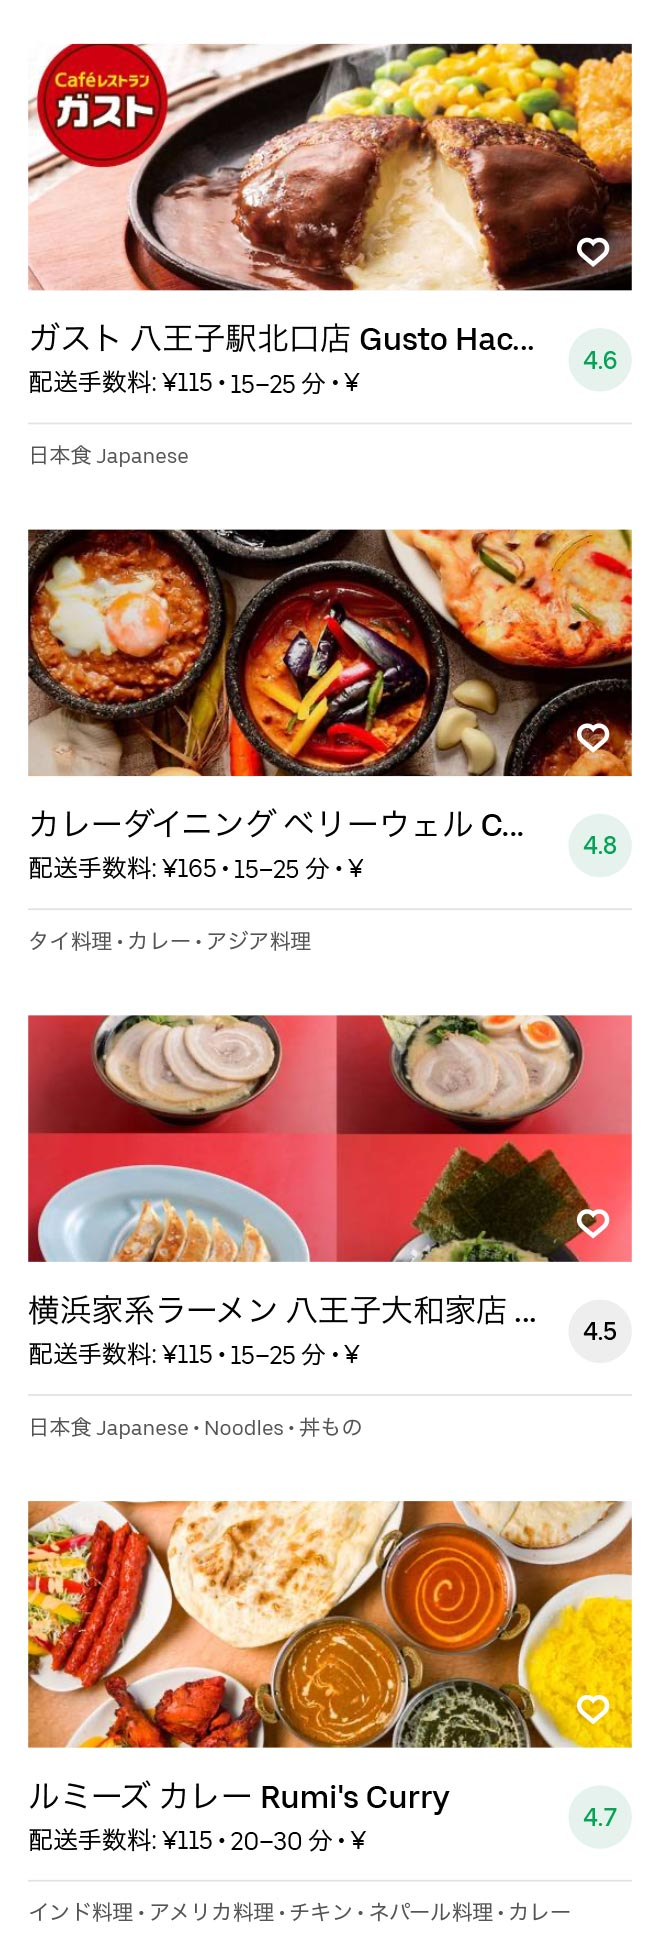 Hatioji menu 2010 09